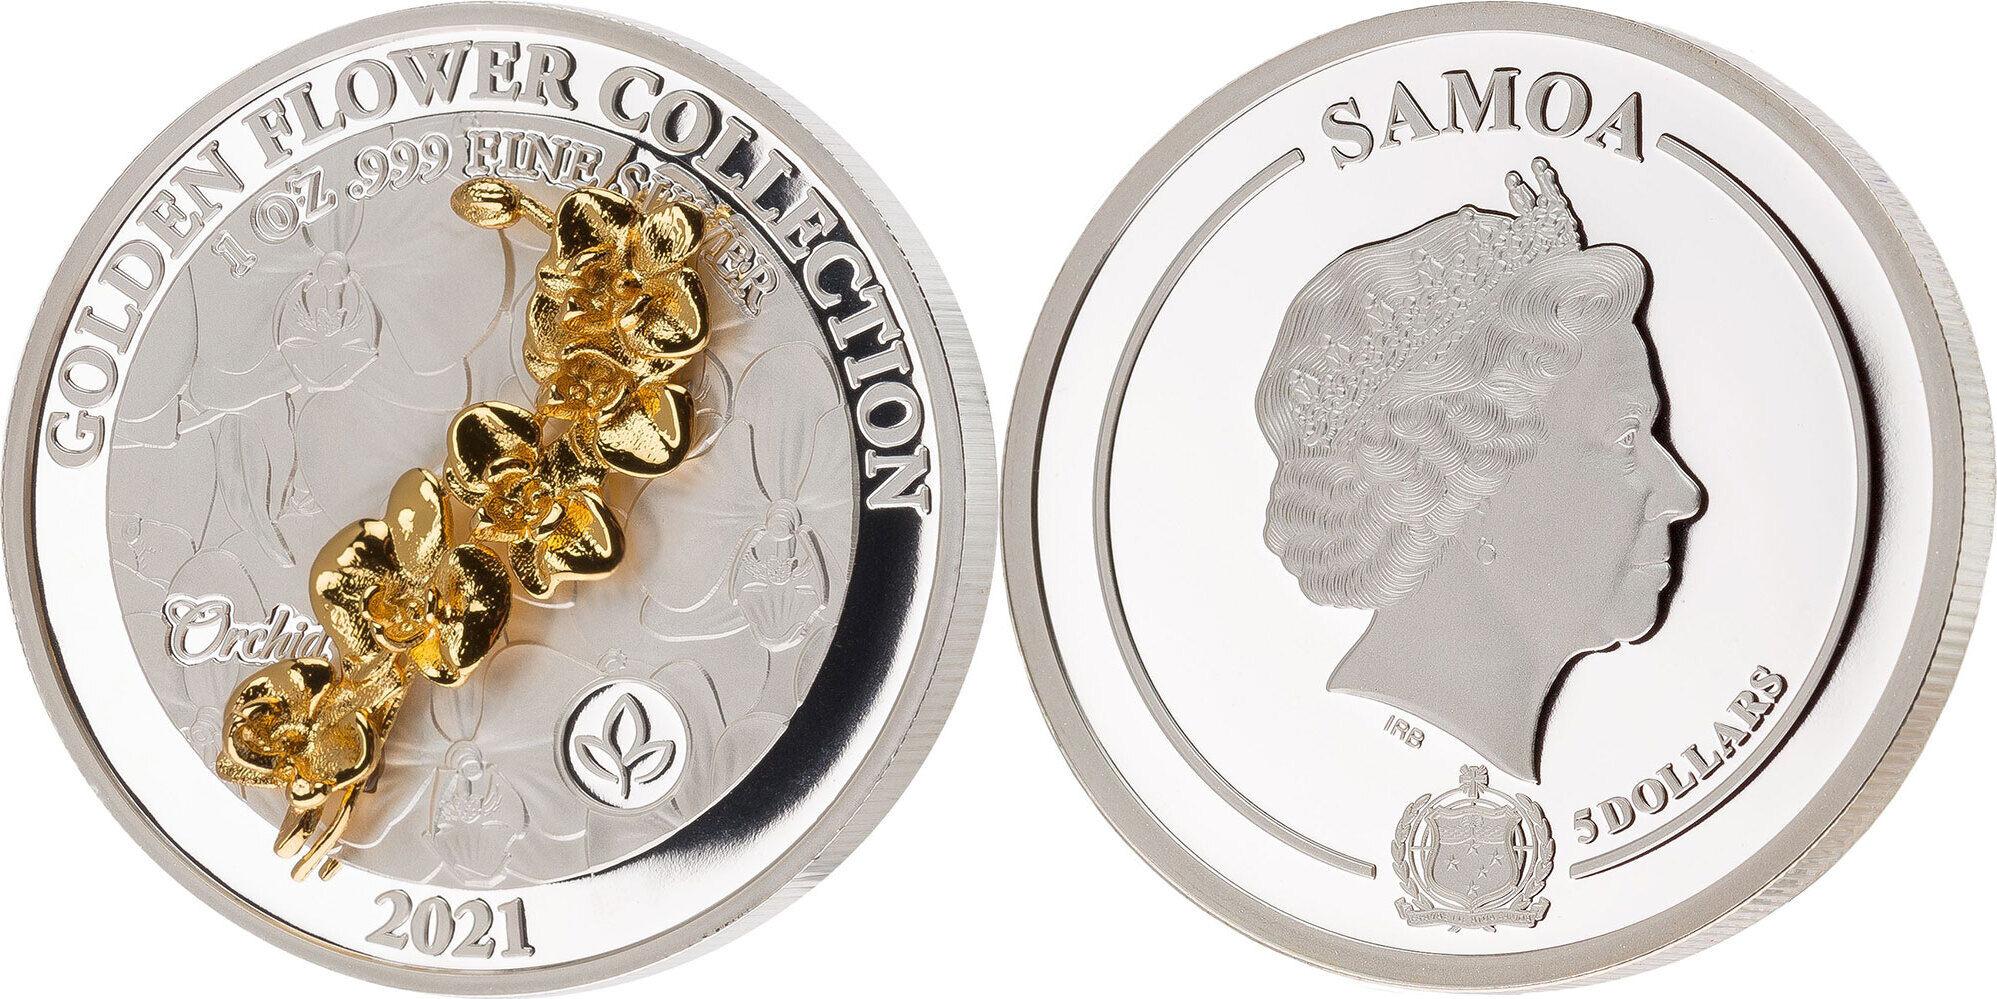 samoa-2021-collection-fleur-doree-orchidee